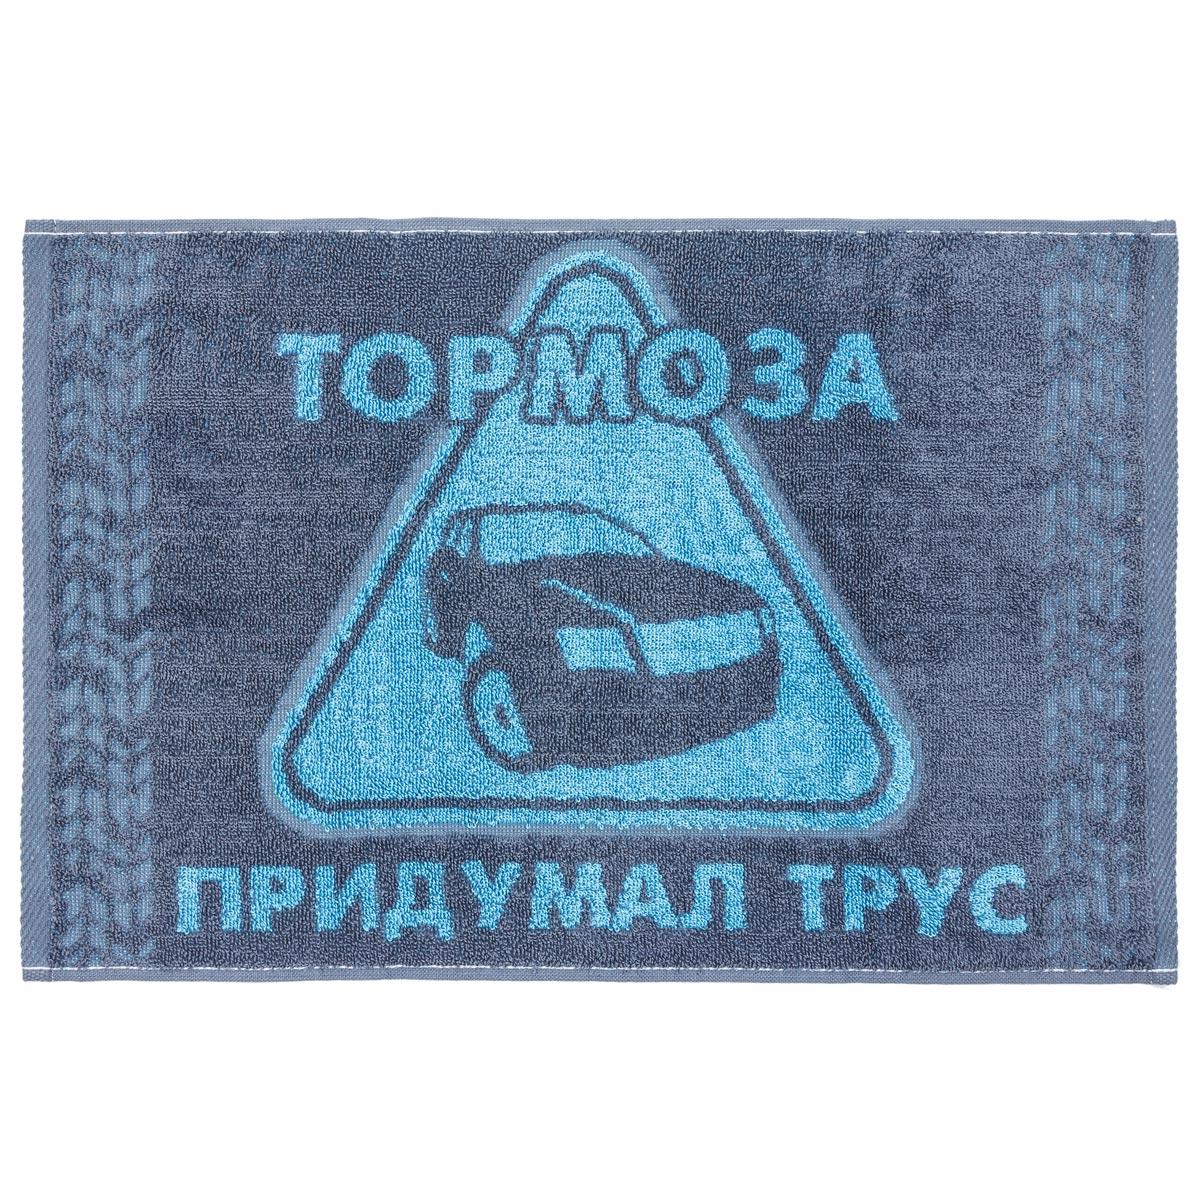 Полотенце Тормоза придумал трус р. 30х50Махровые полотенца<br>Плотность:380-400 г/кв. м<br><br>Тип: Полотенце<br>Размер: 30х50<br>Материал: Махра